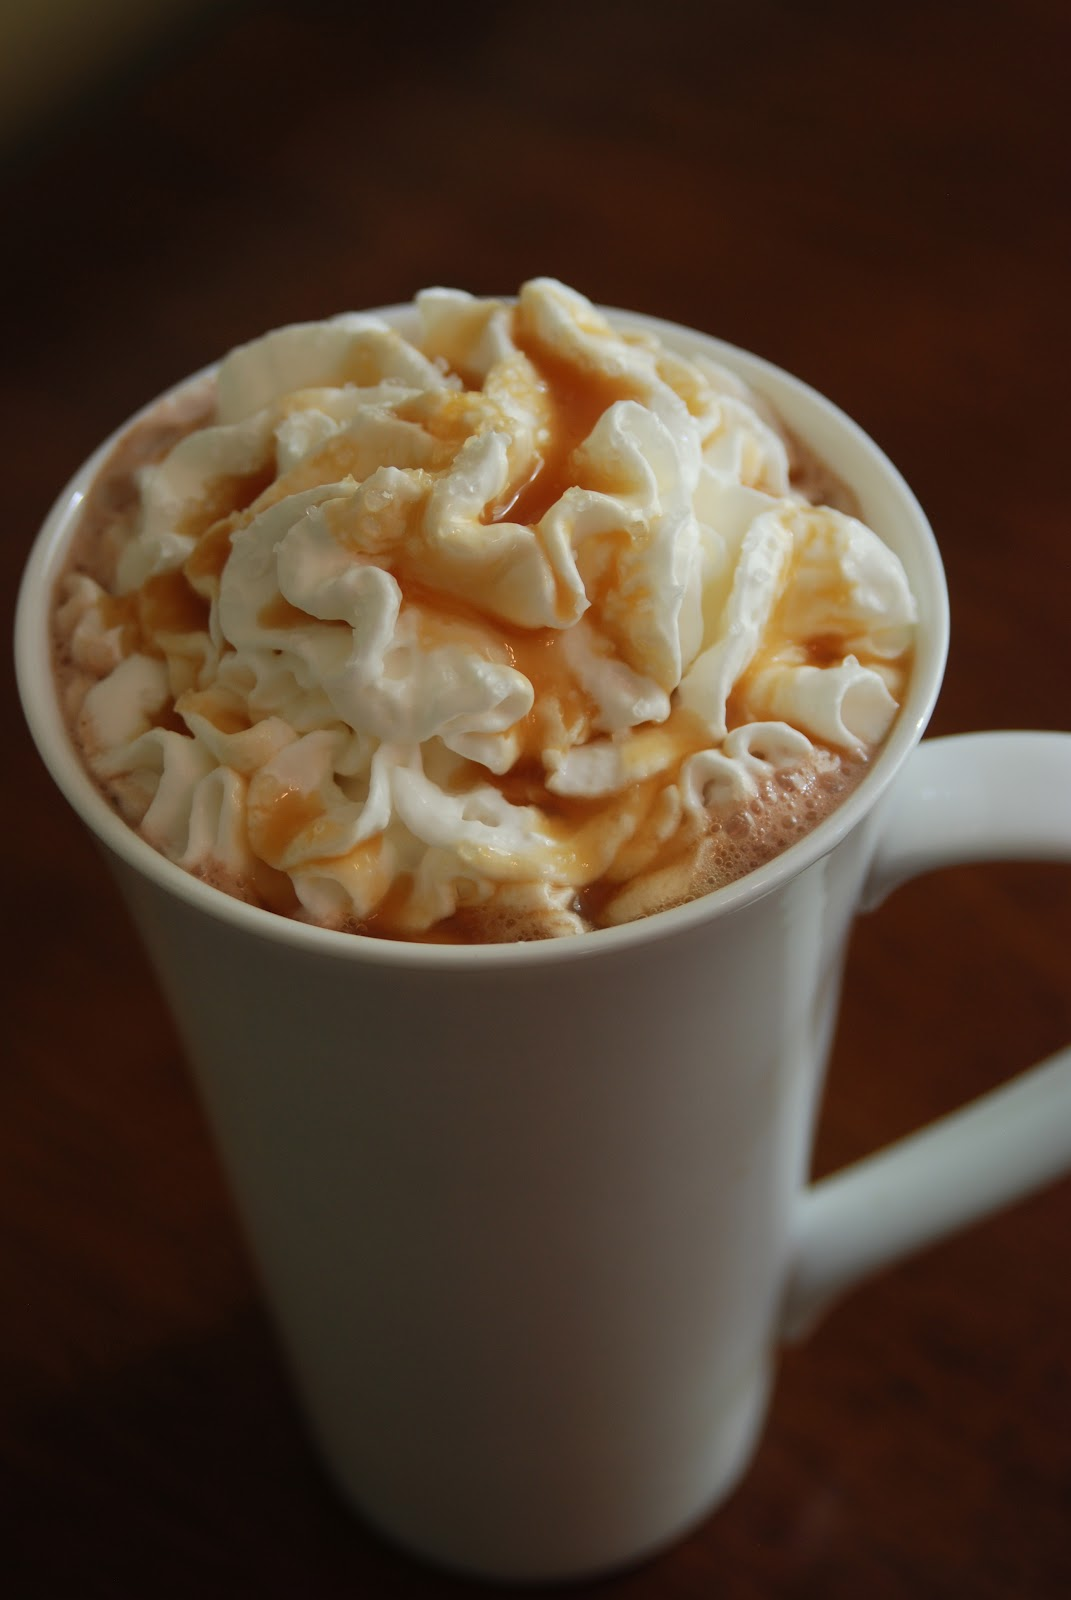 Copycat Starbucks Salted Caramel Hot Chocolate